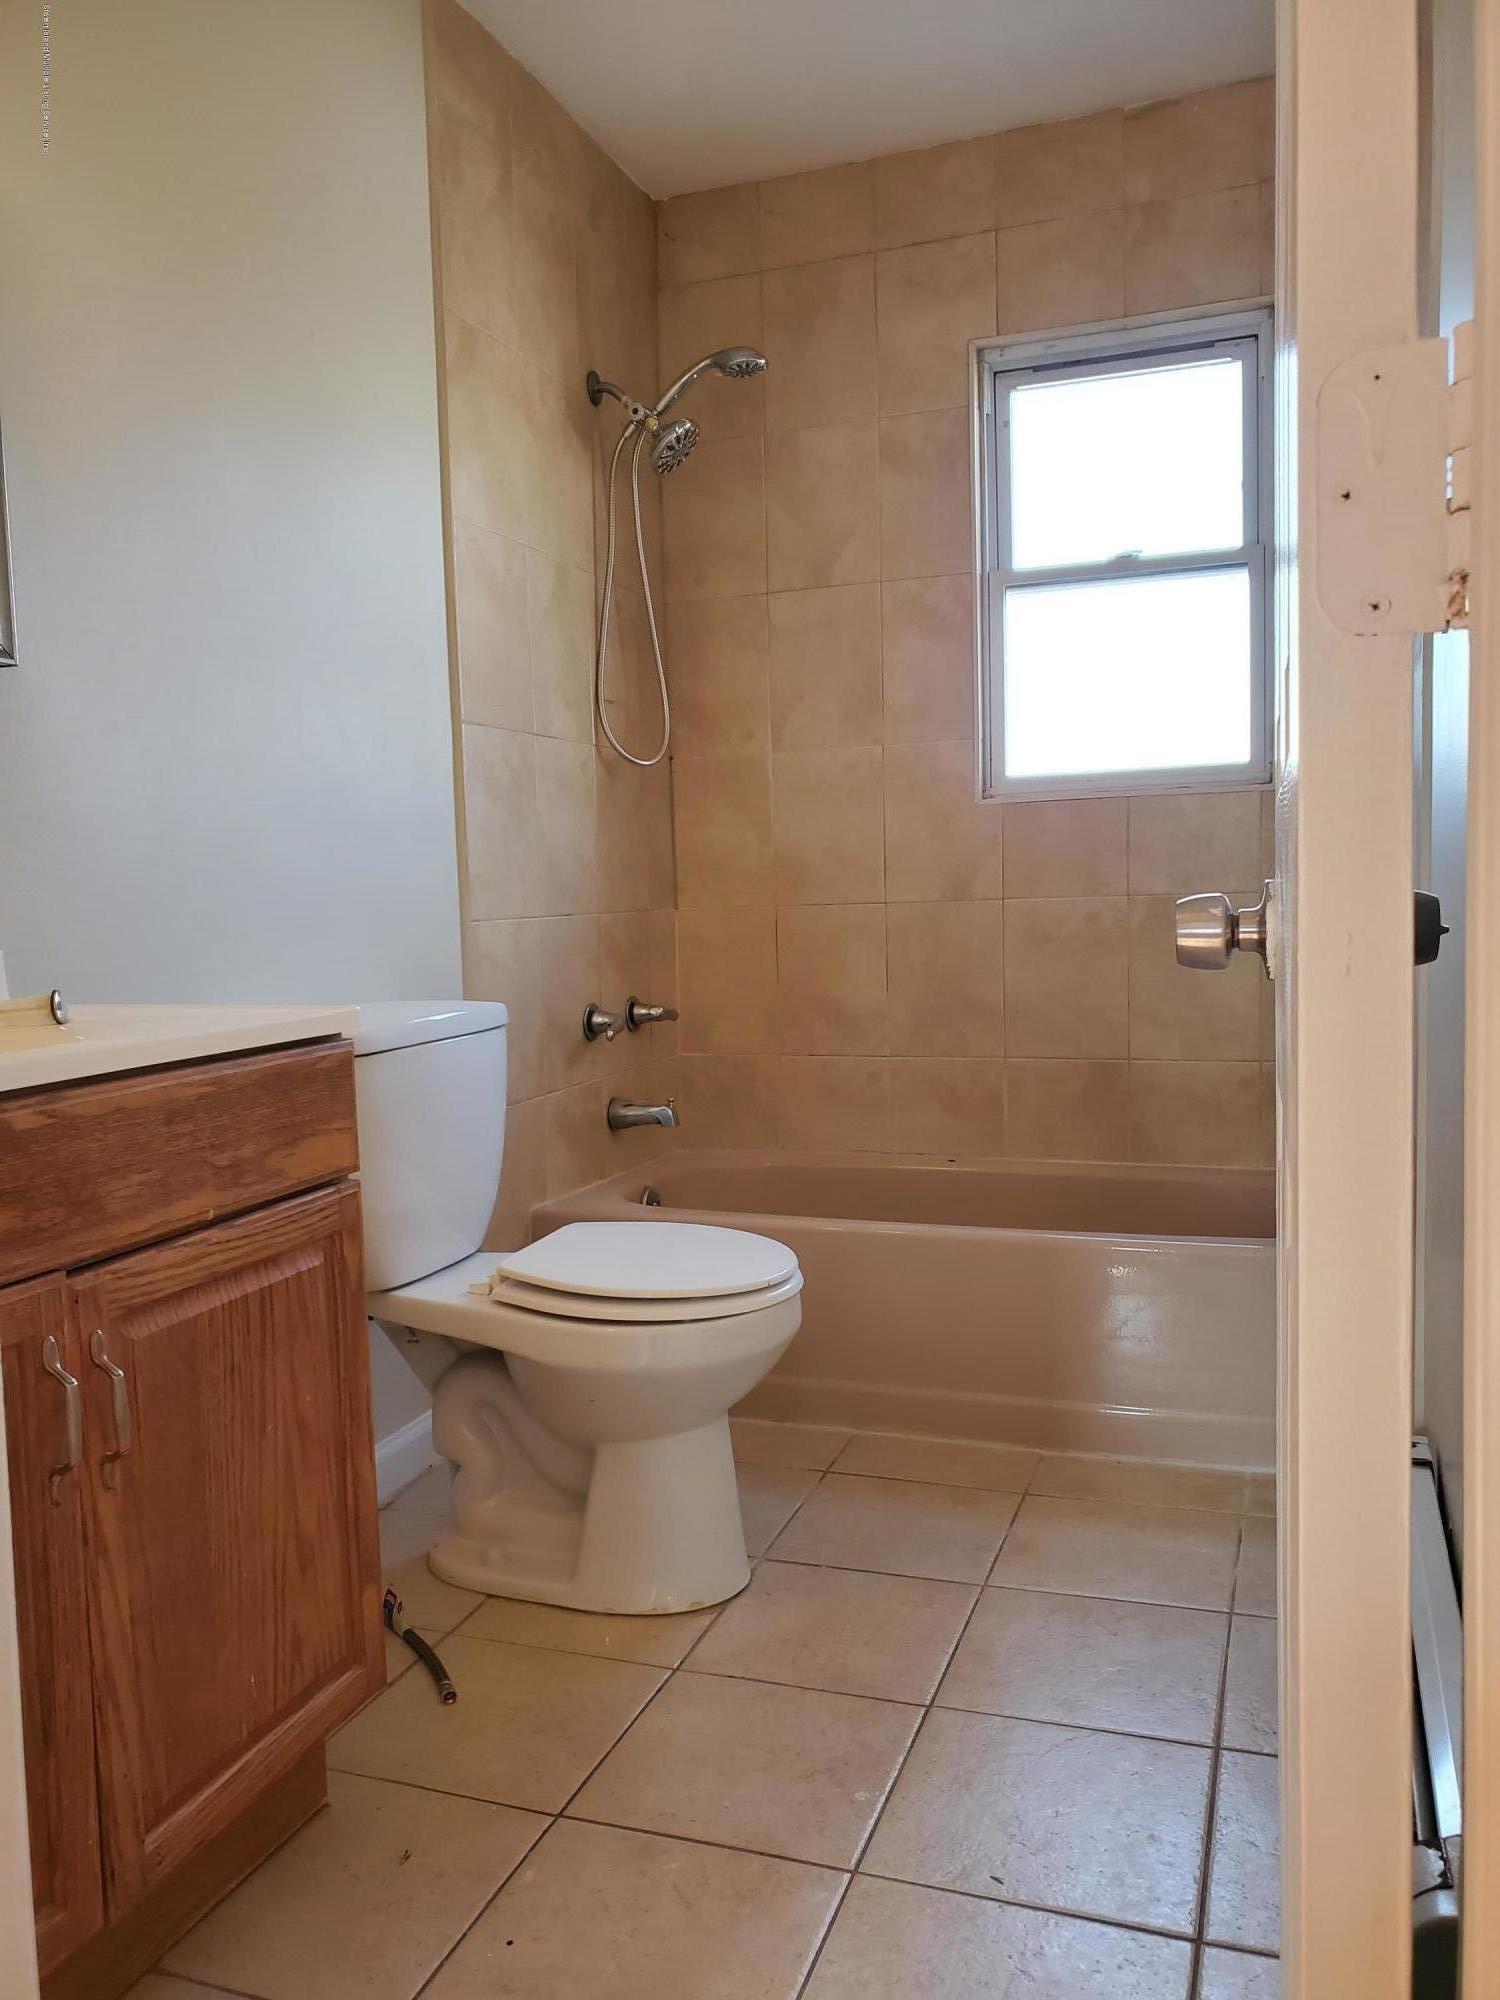 221 Giffords Lane,Staten Island,New York,10308,United States,3 Bedrooms Bedrooms,5 Rooms Rooms,1 BathroomBathrooms,Res-Rental,Giffords,1134292